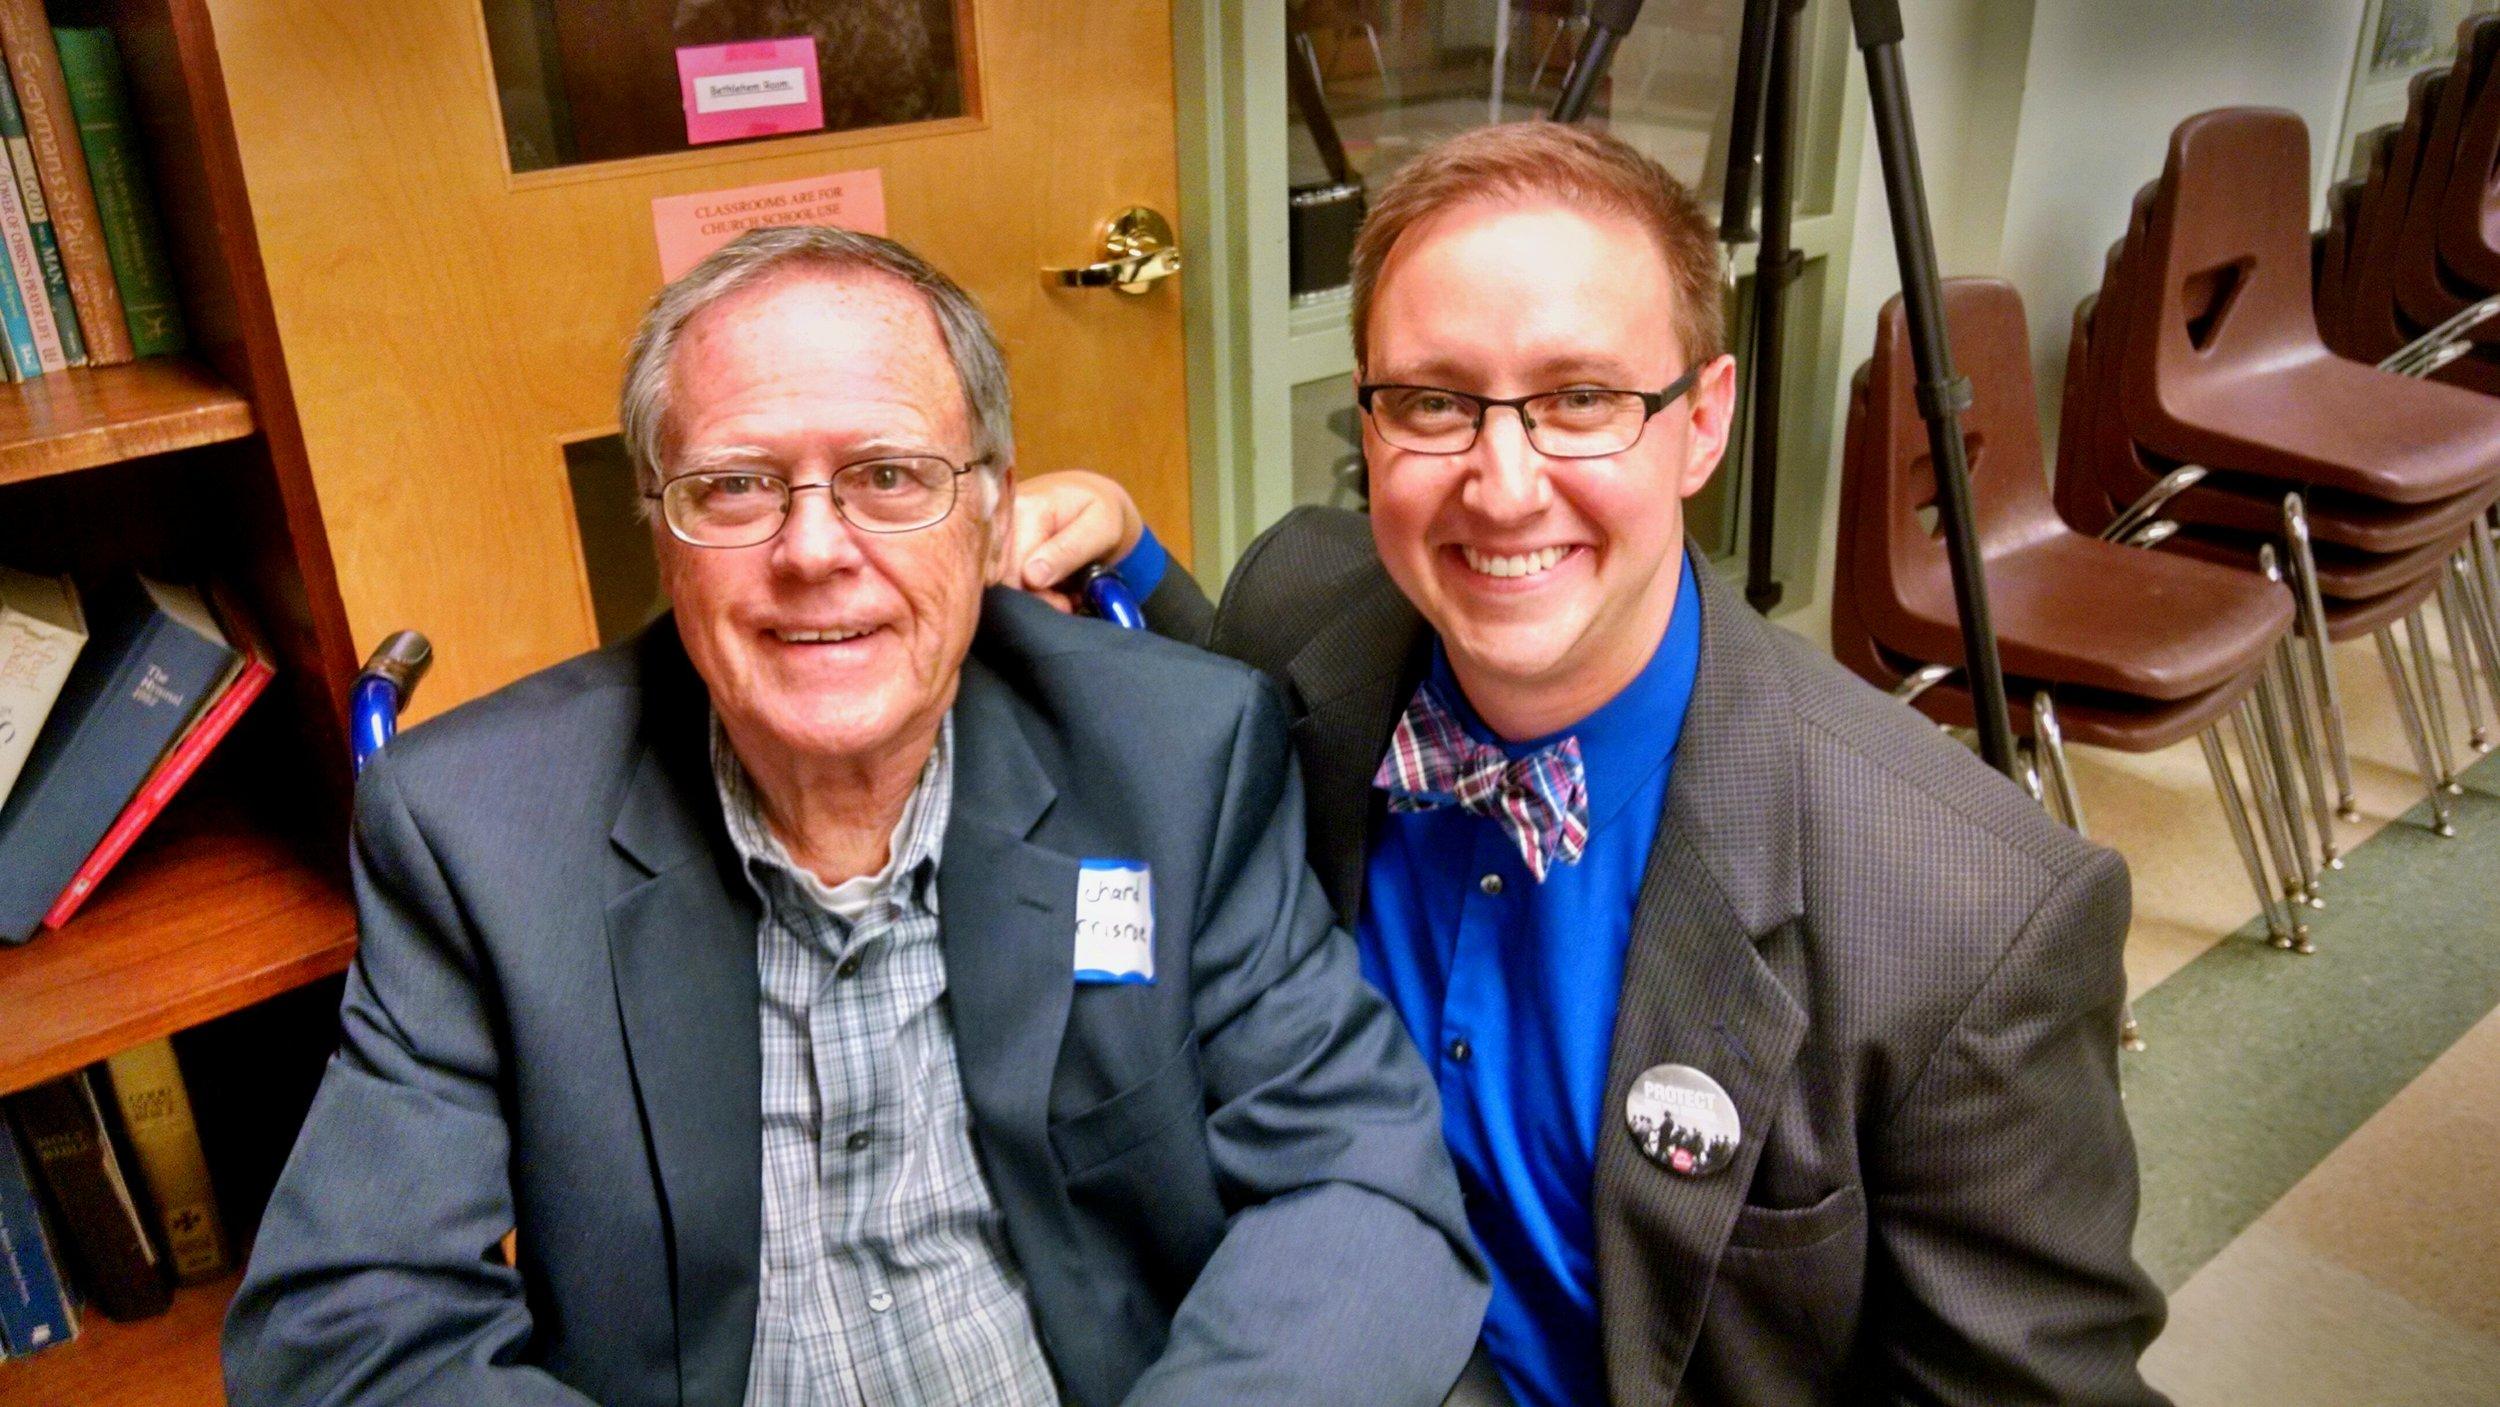 Derek with Richard Morrisroe, who was in Alabama with Jonathan Daniels